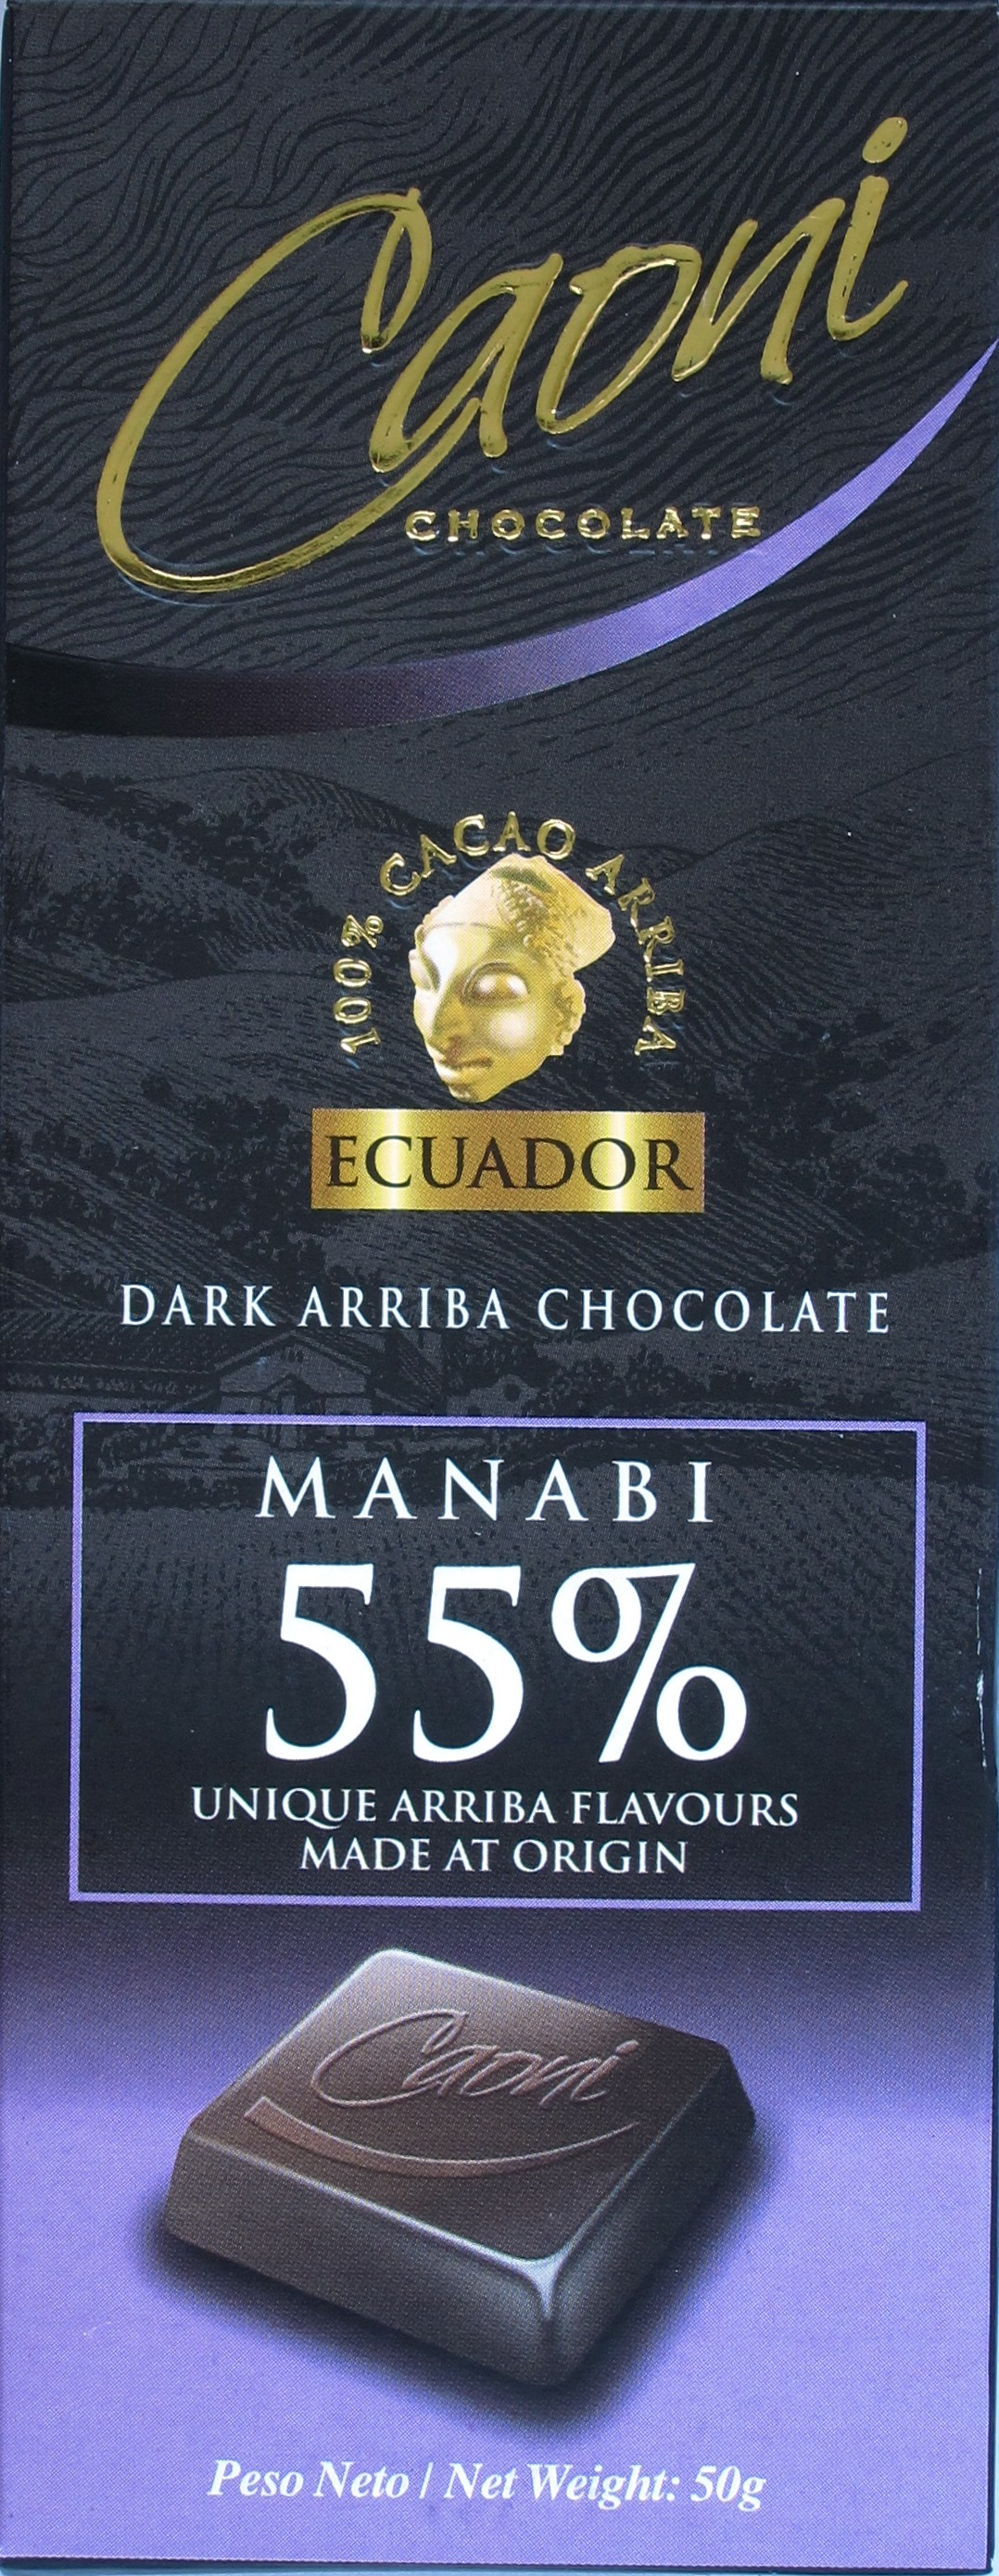 Caoni Manabi 55%, Vorderseite